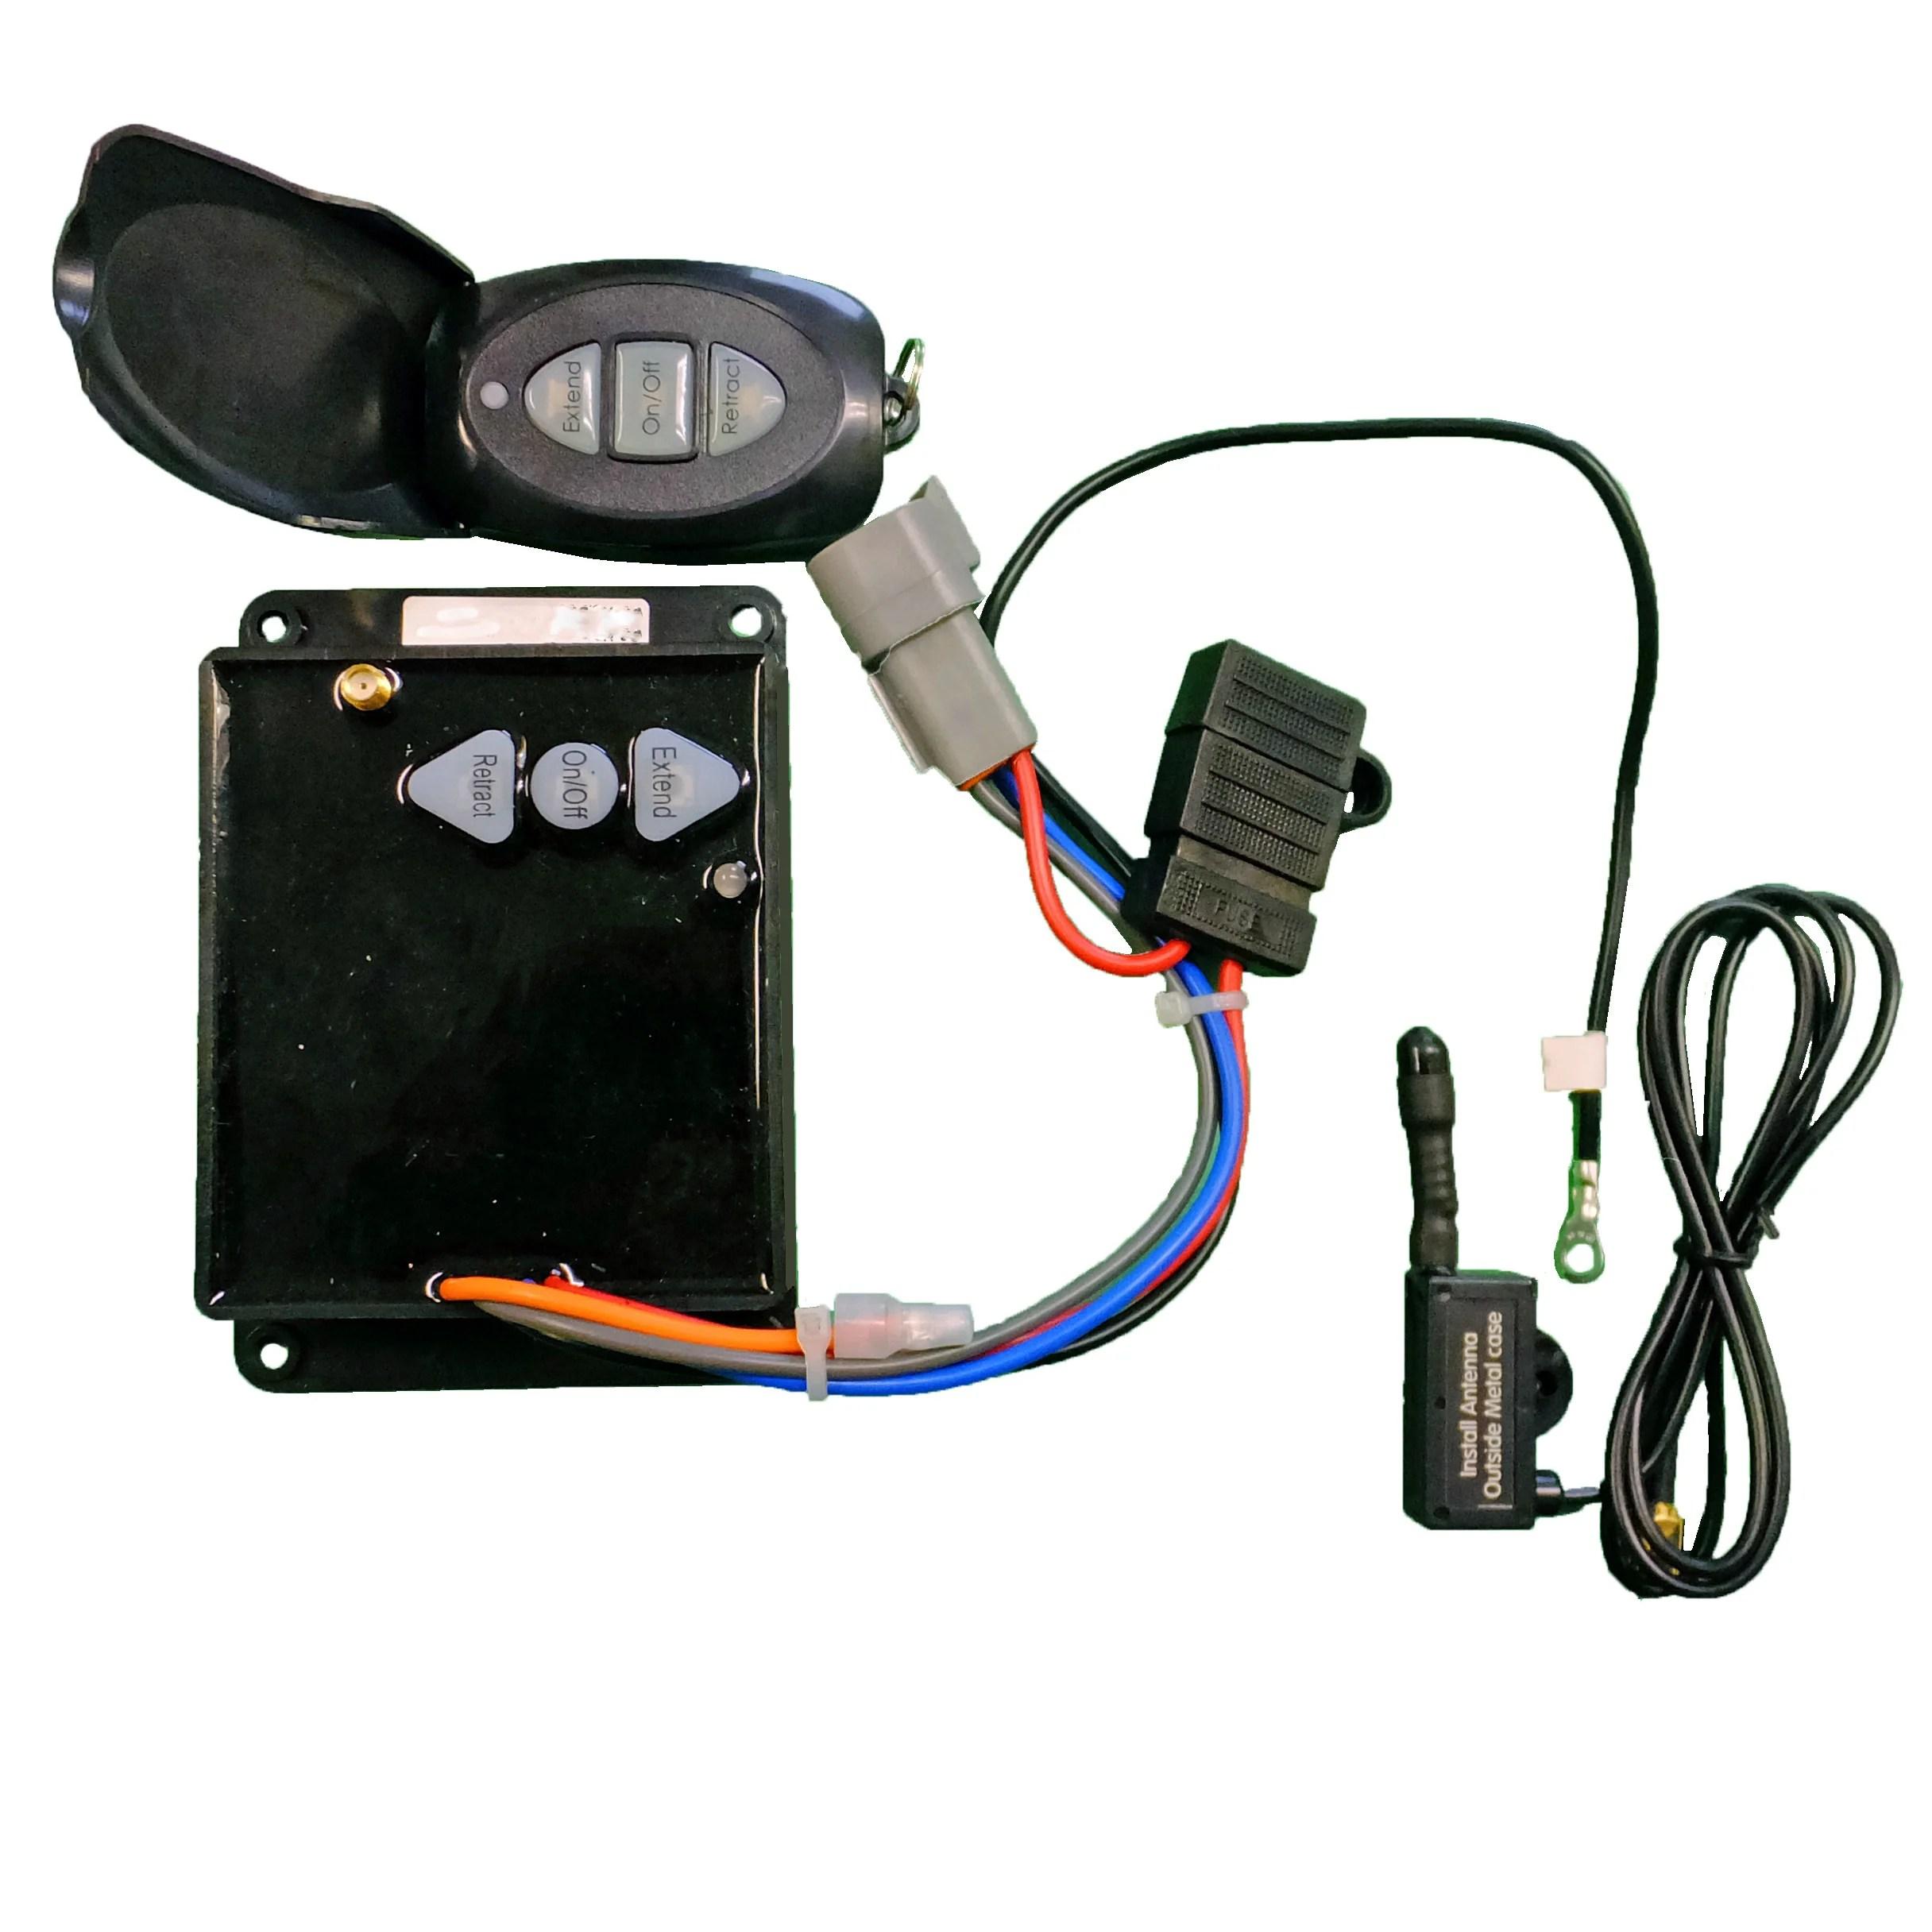 medium resolution of wireless dump trailer remote kit bucher easy install power up gravi www ordertrailerparts com